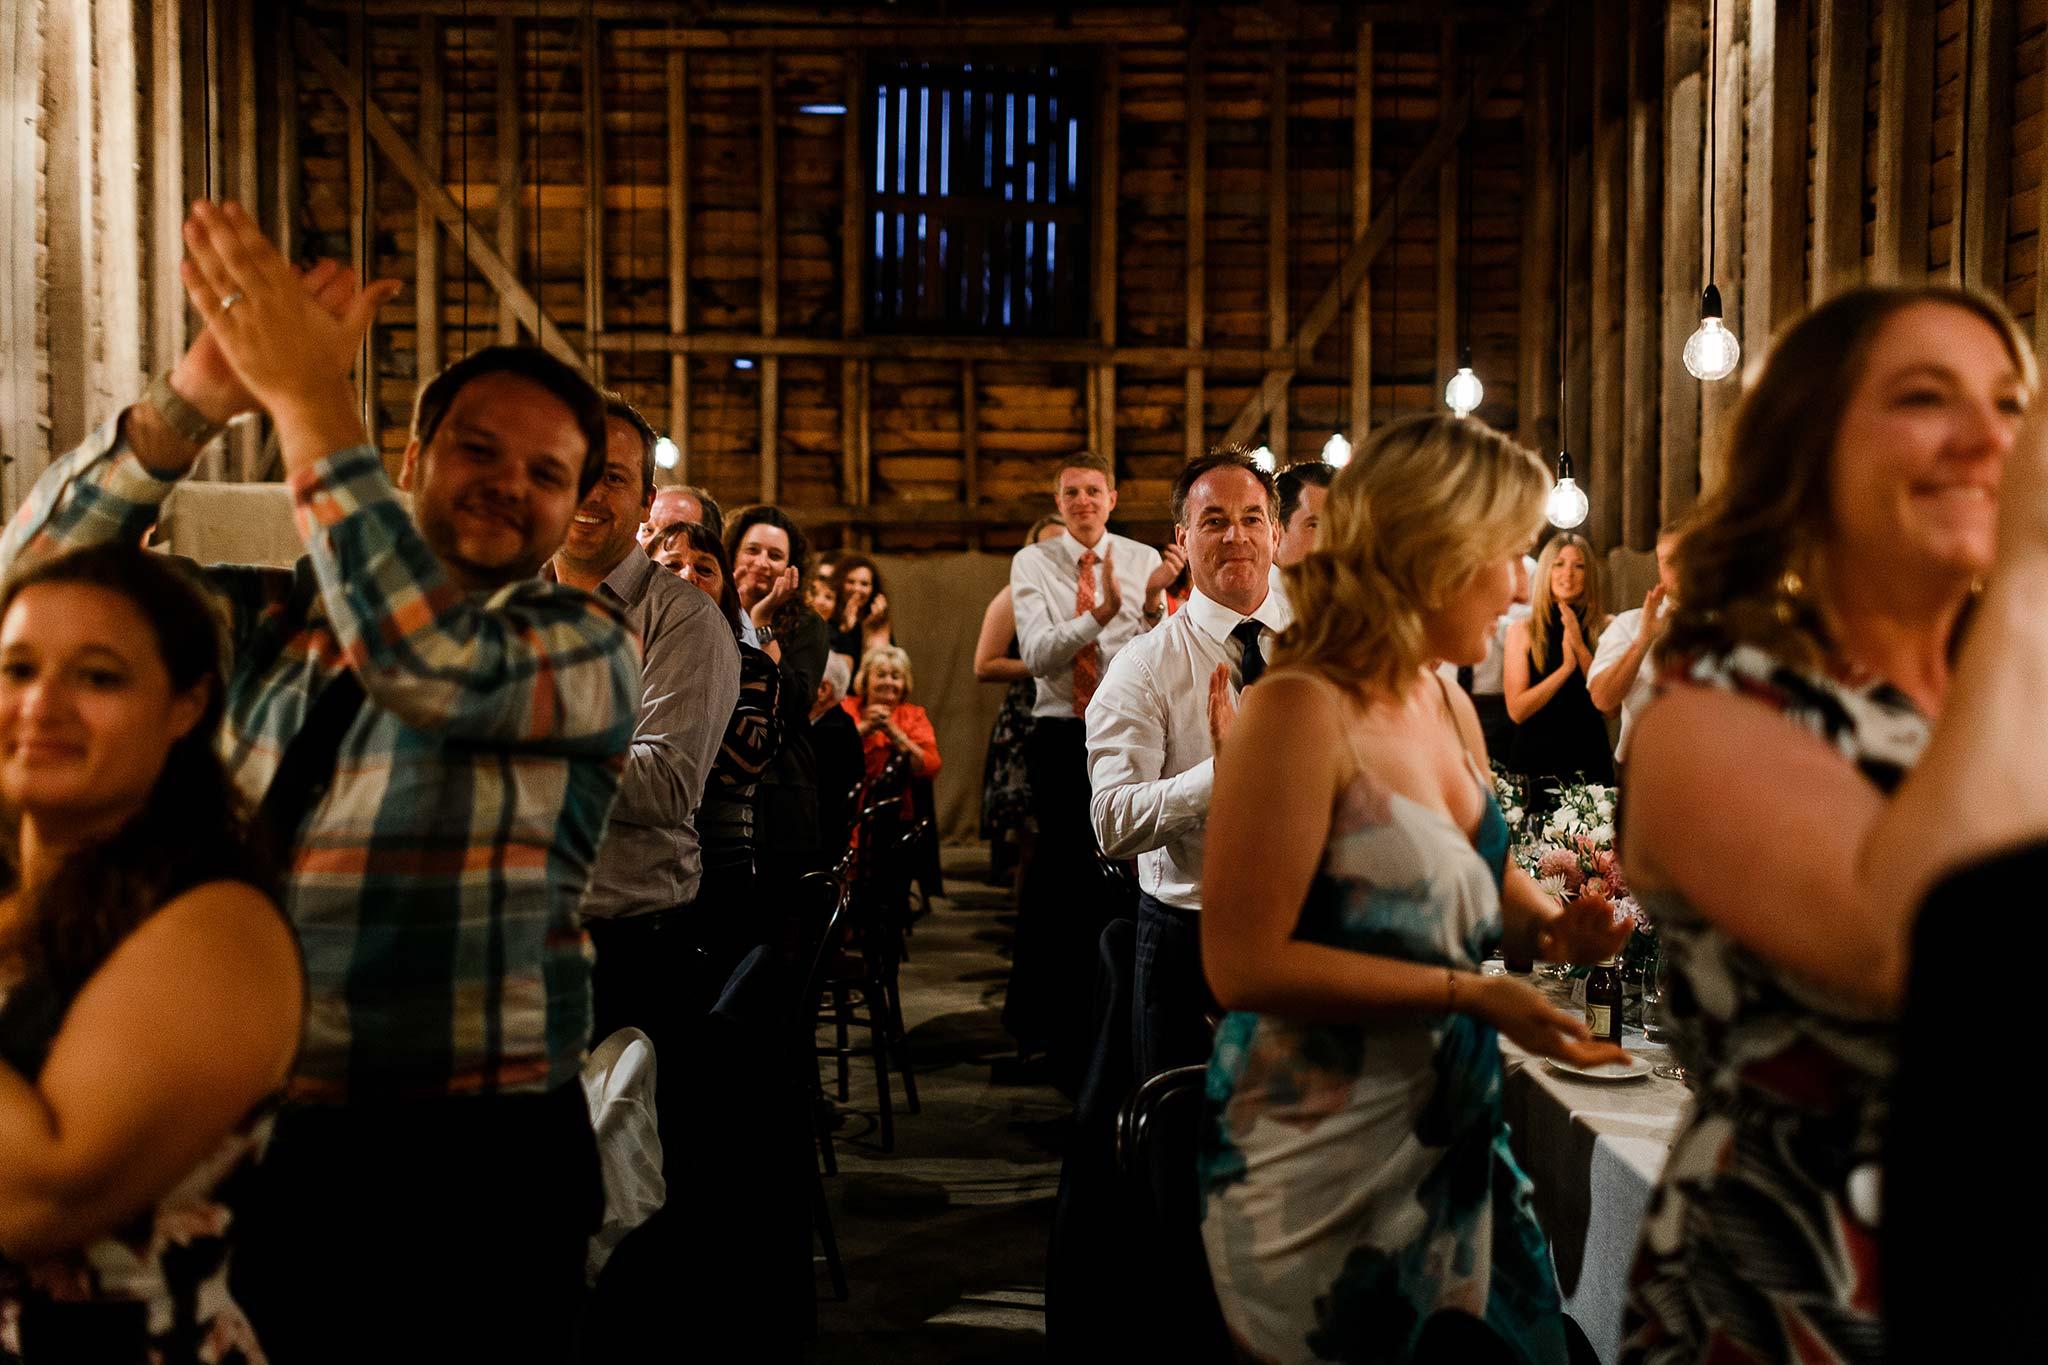 Launceston-Brickendon-barn-Wedding-Photographer-reception-applause